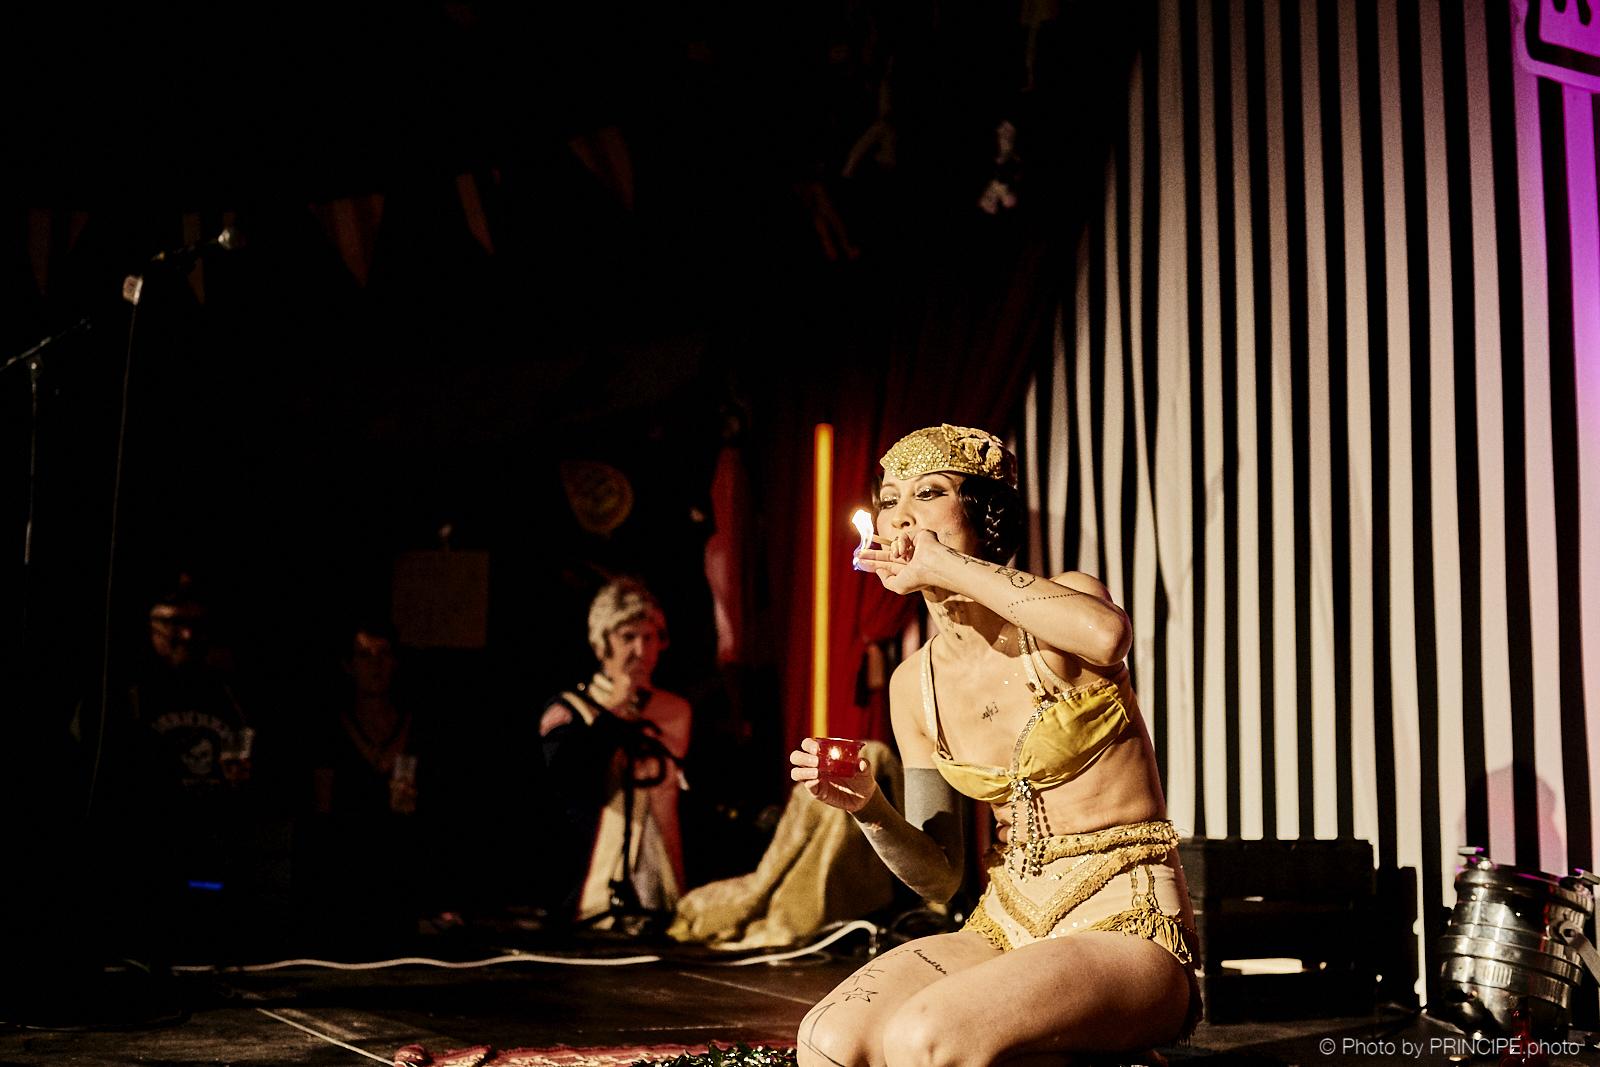 Mademoiselle Lalla Morte @ Voodoo Rhythm Circus